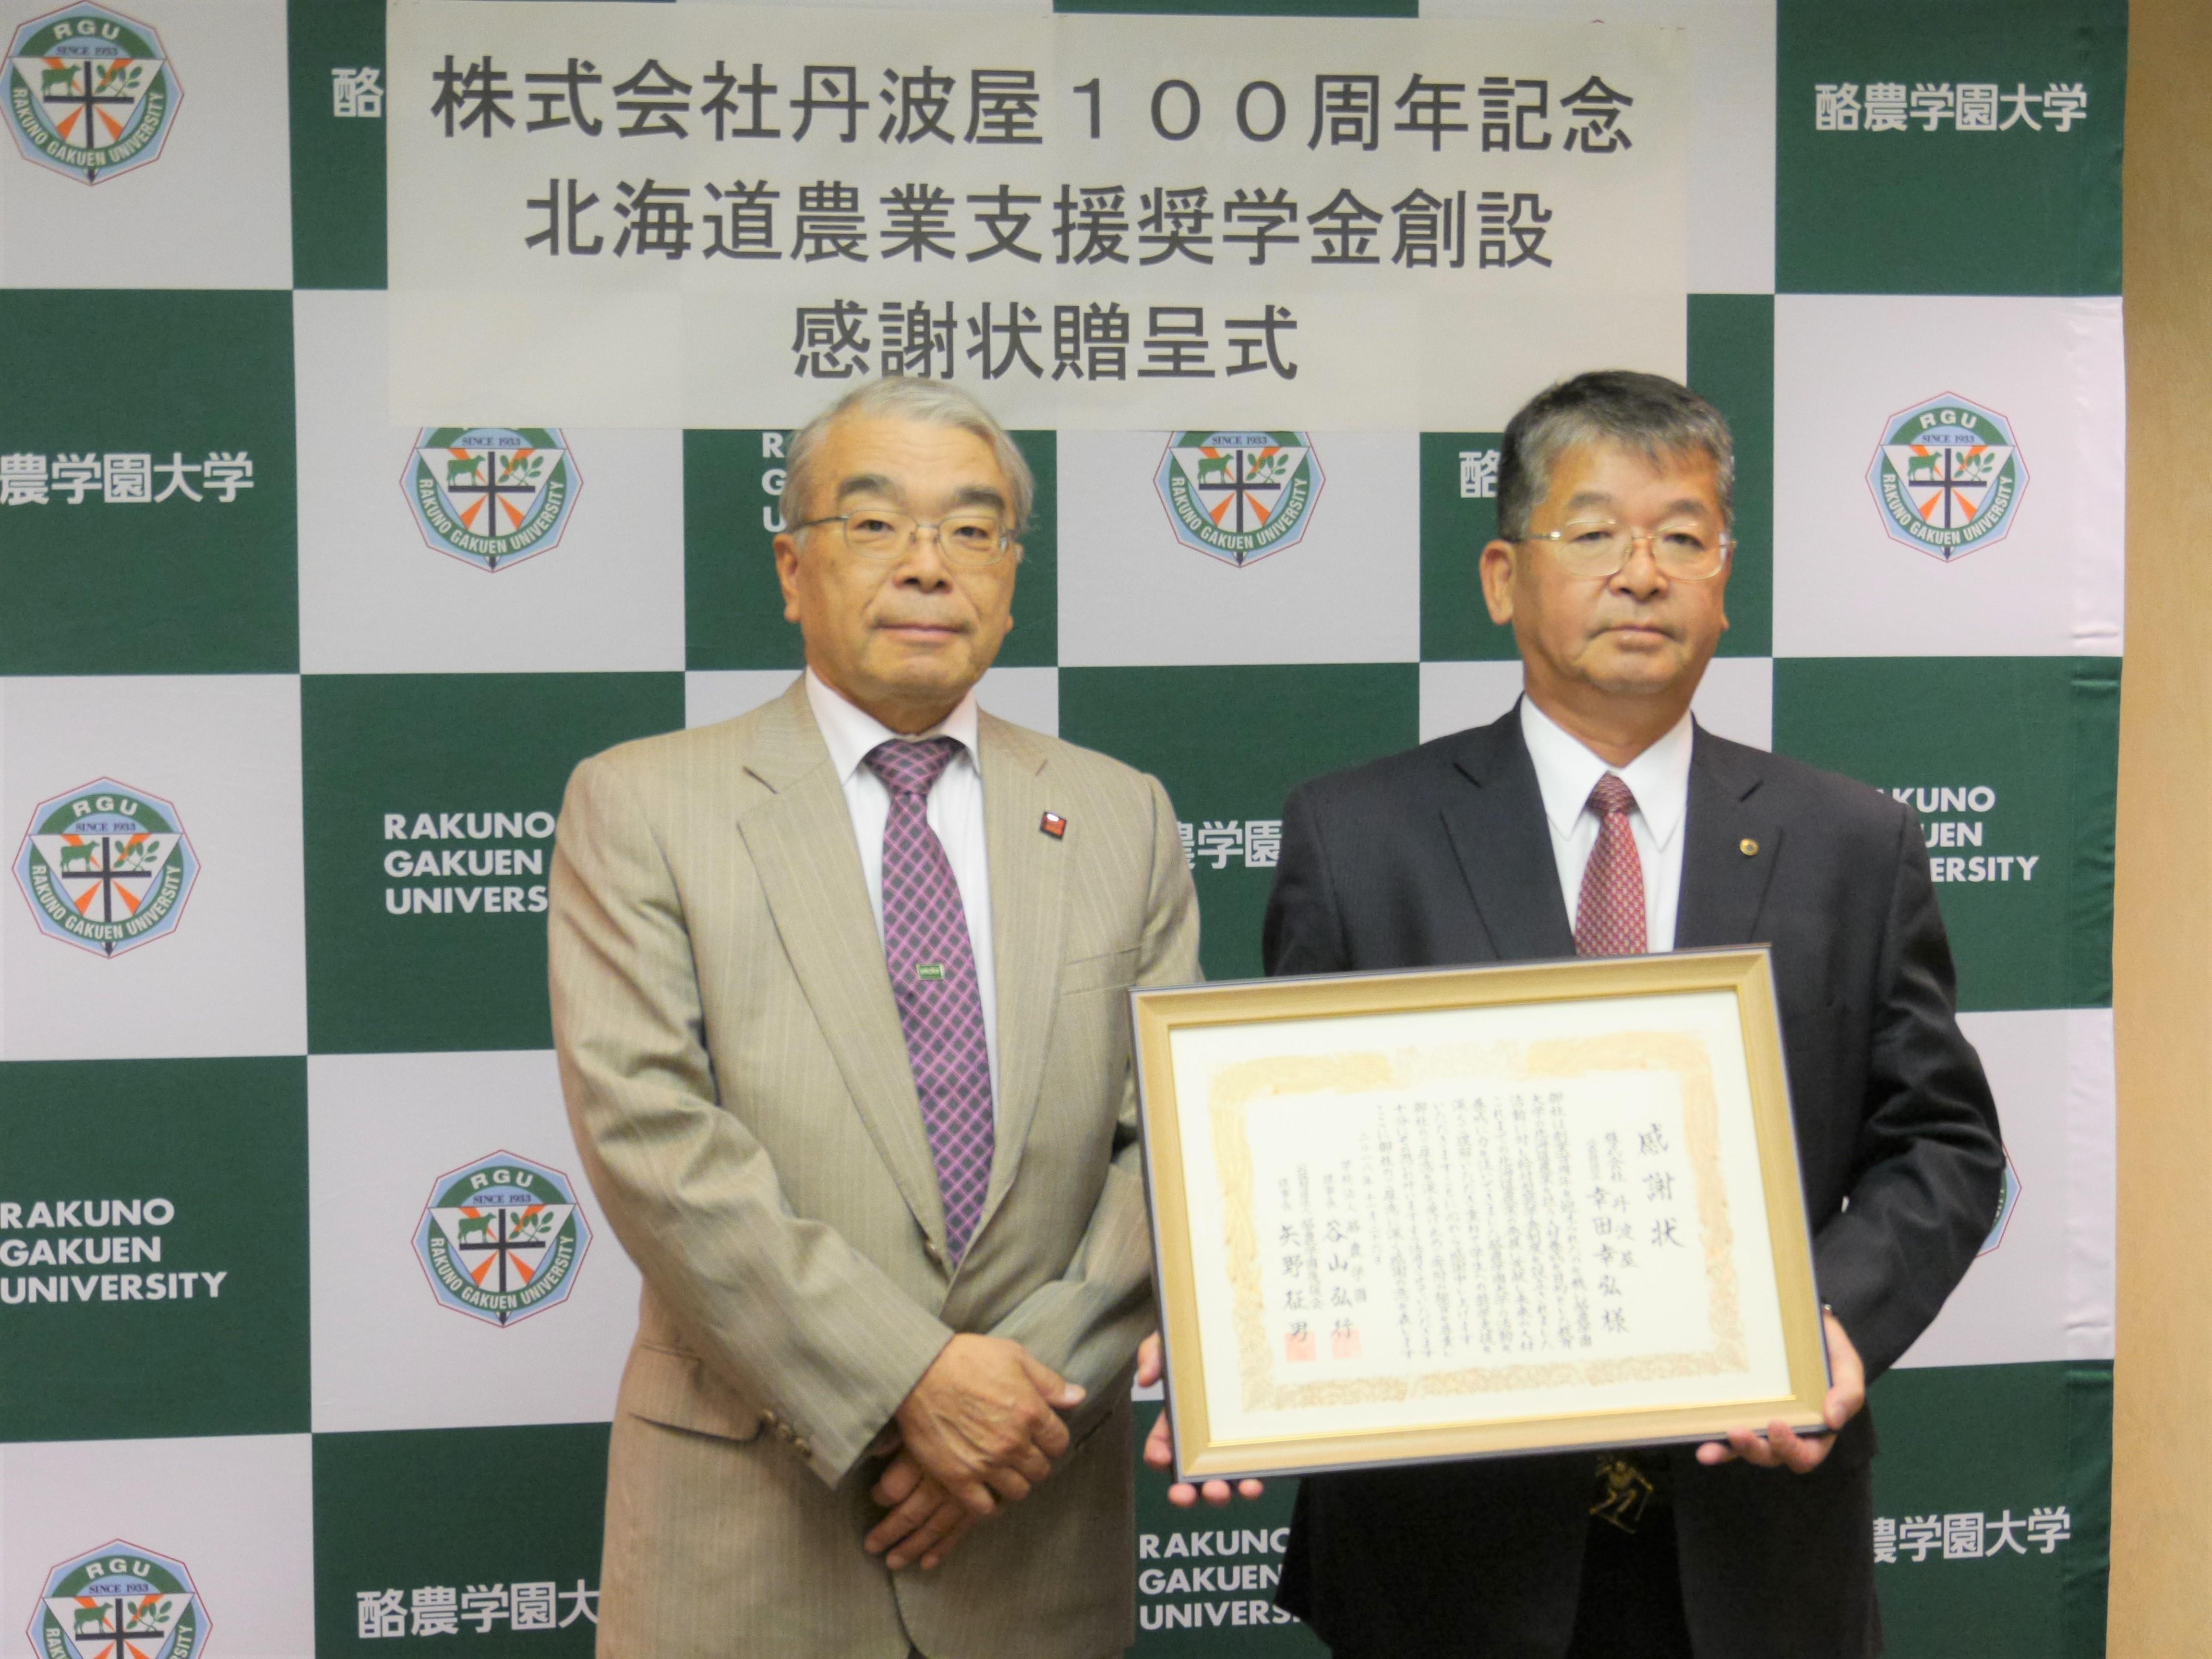 酪農学園大学に「北海道農業支援奨学金」が創設 -- 株式会社丹波屋の創業100周年記念事業の一つ